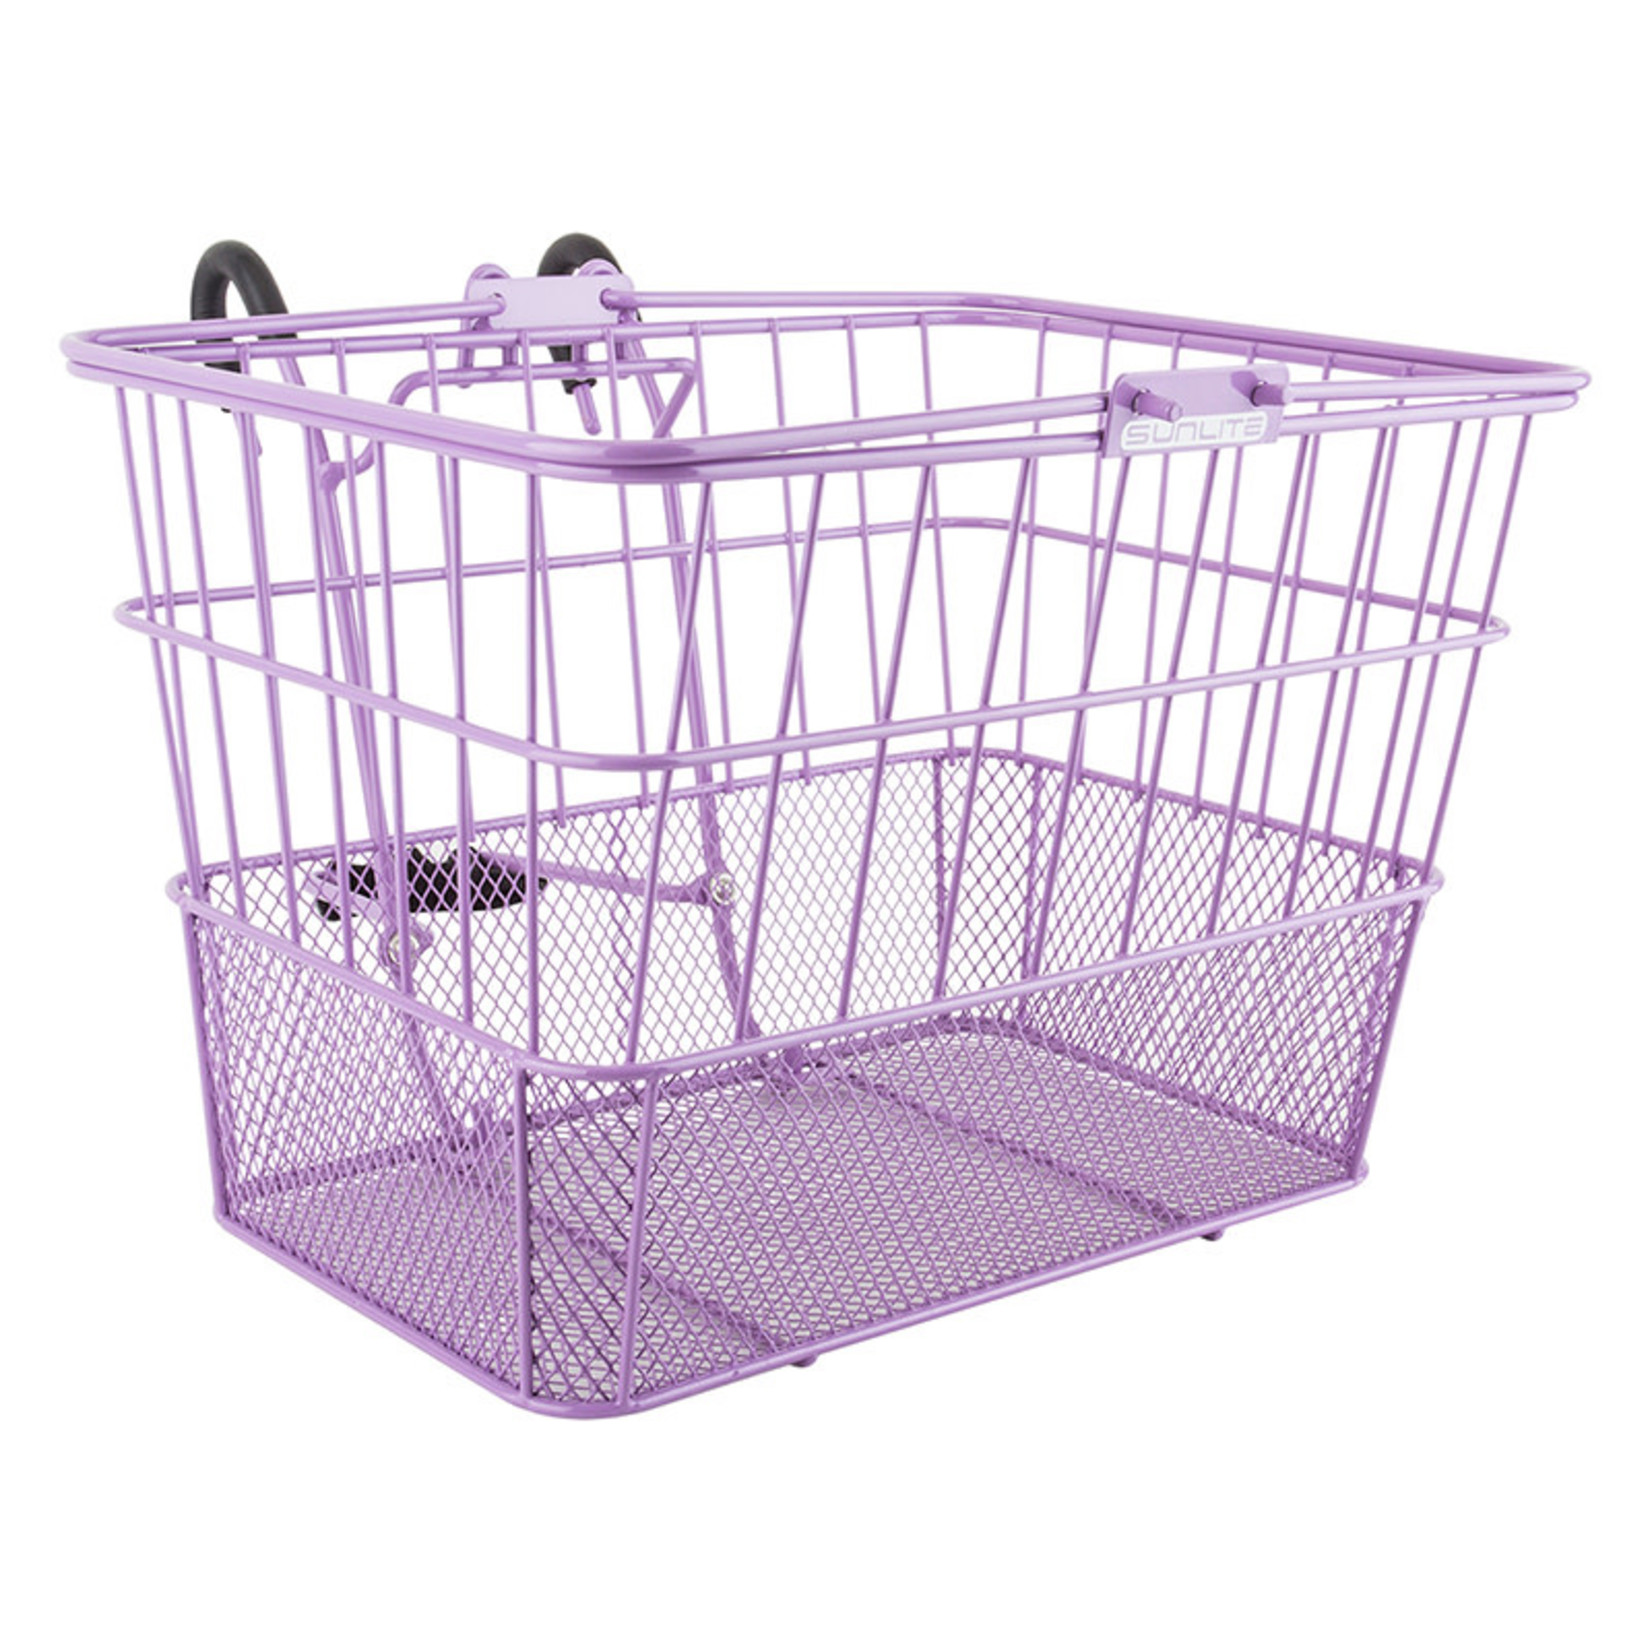 Standard Mesh Bottom Lift-Off Purple